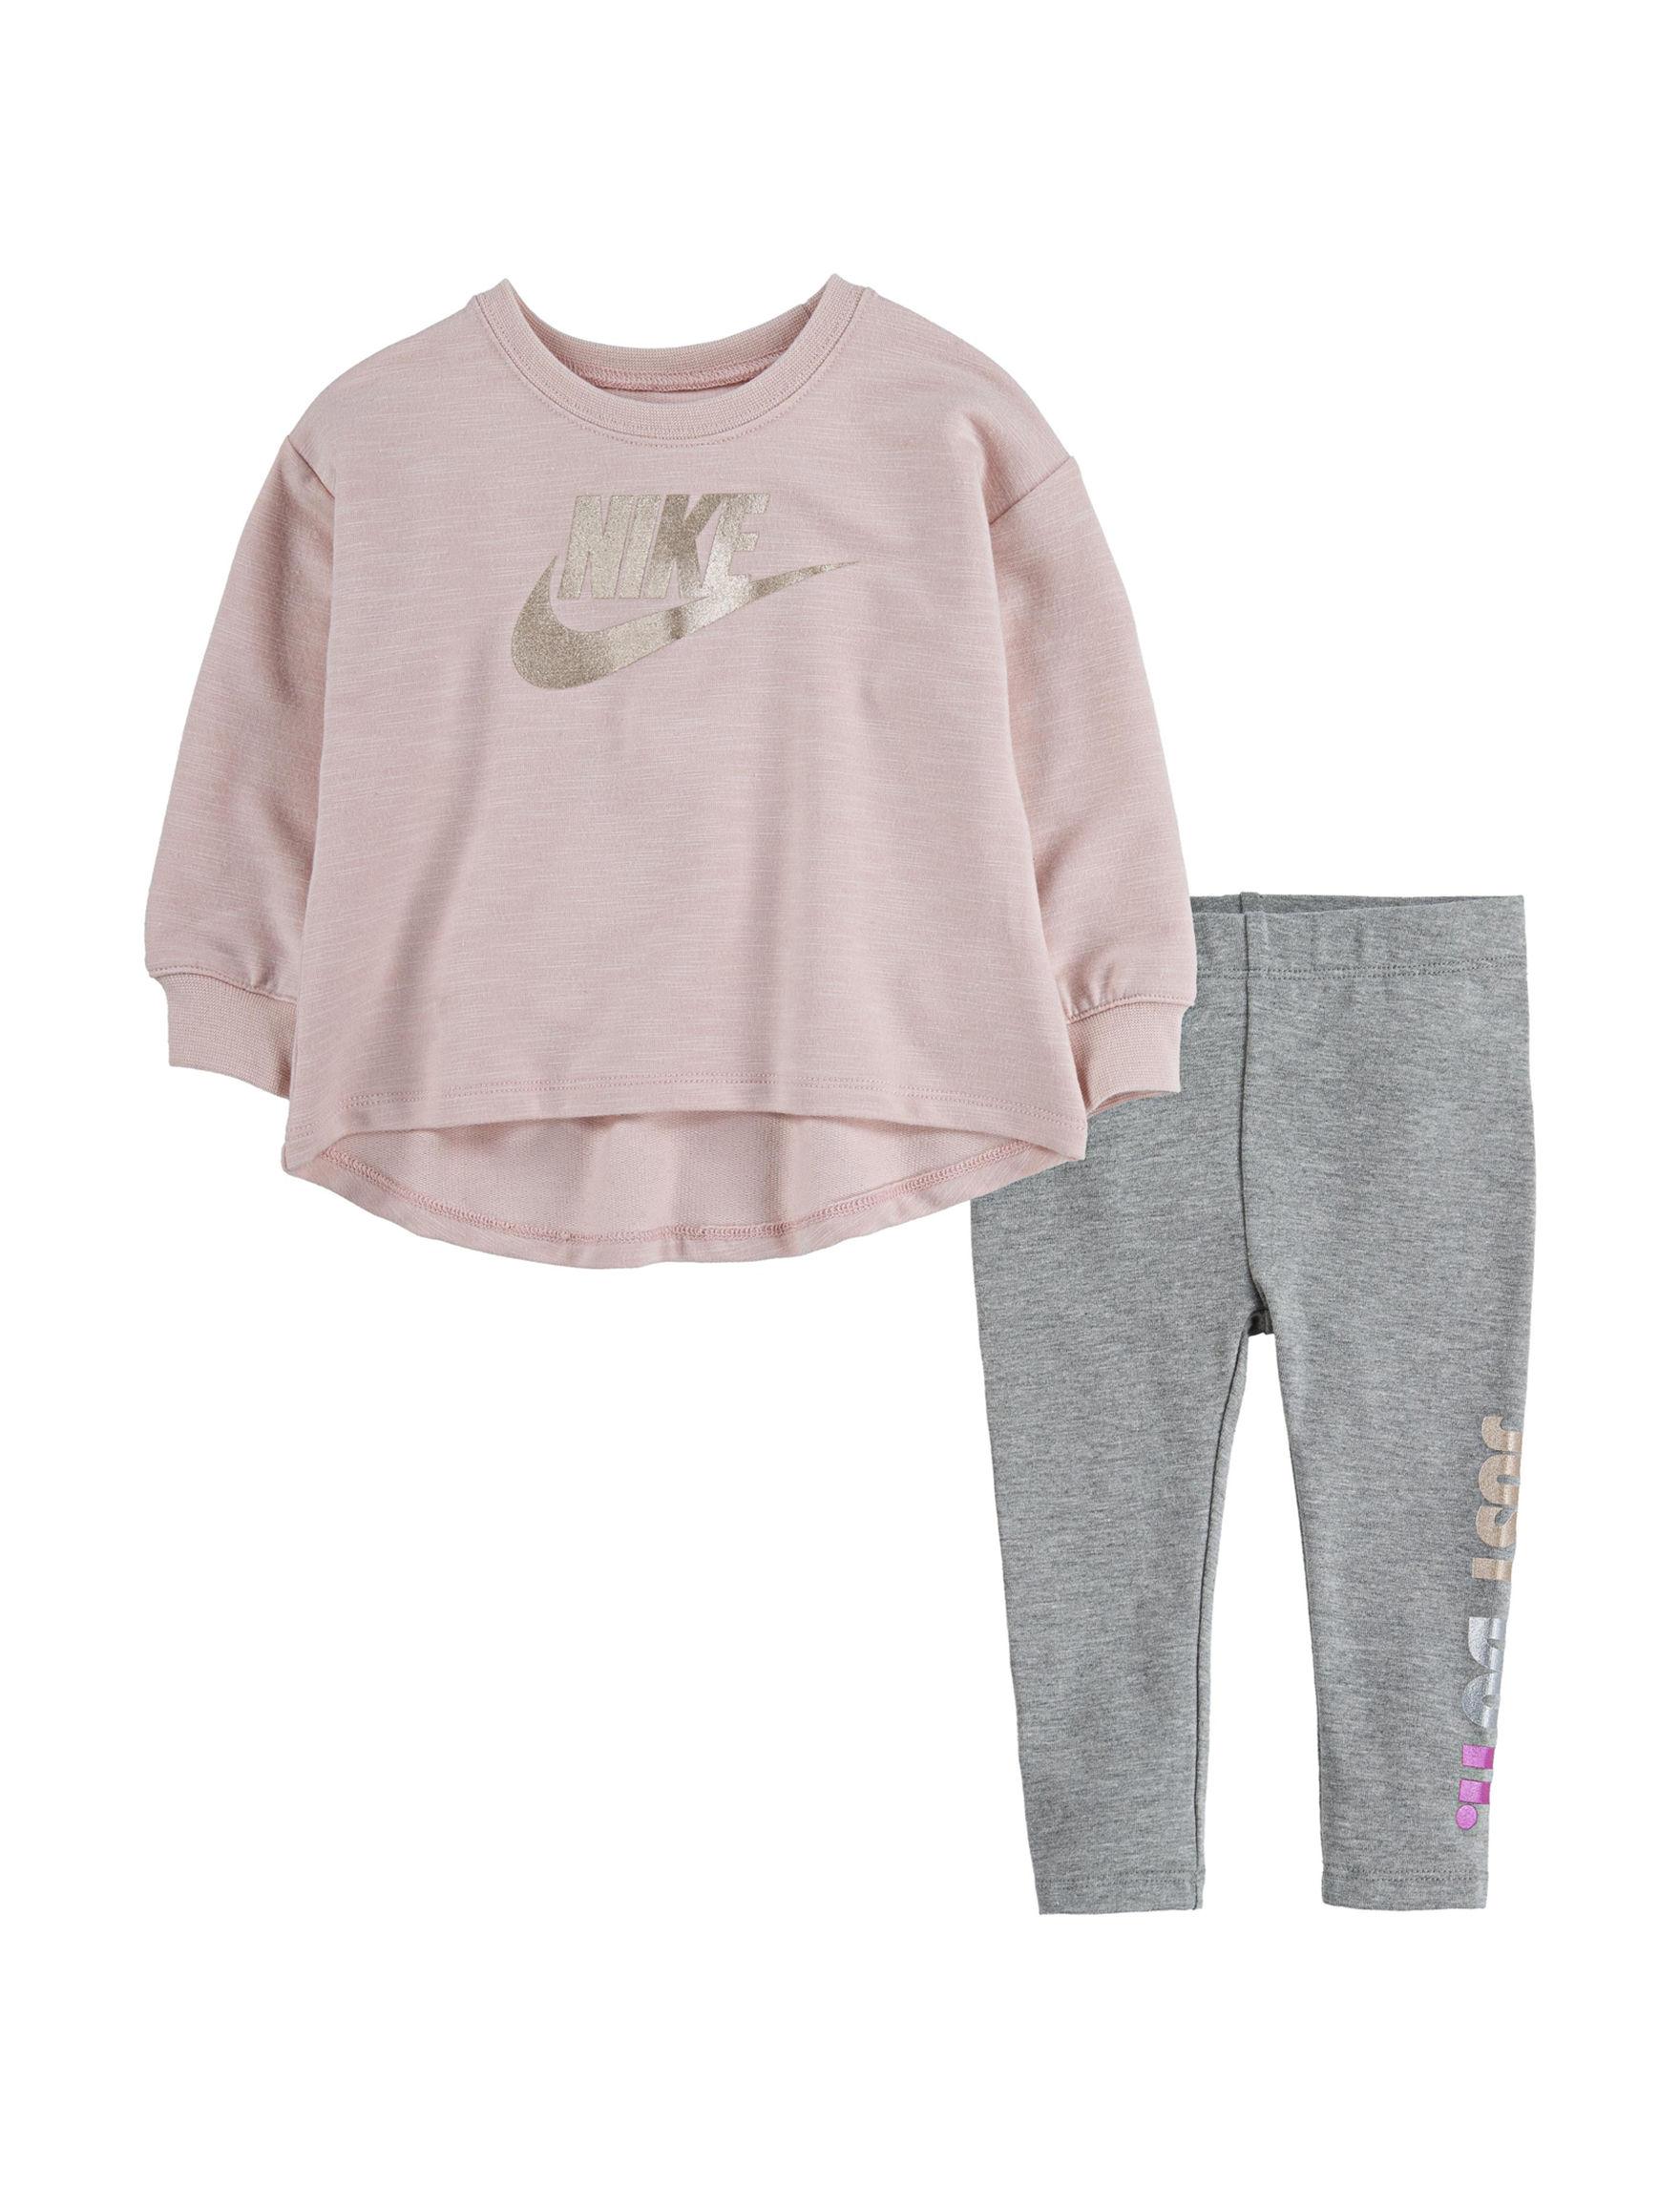 Nike Pink / Grey / Multi